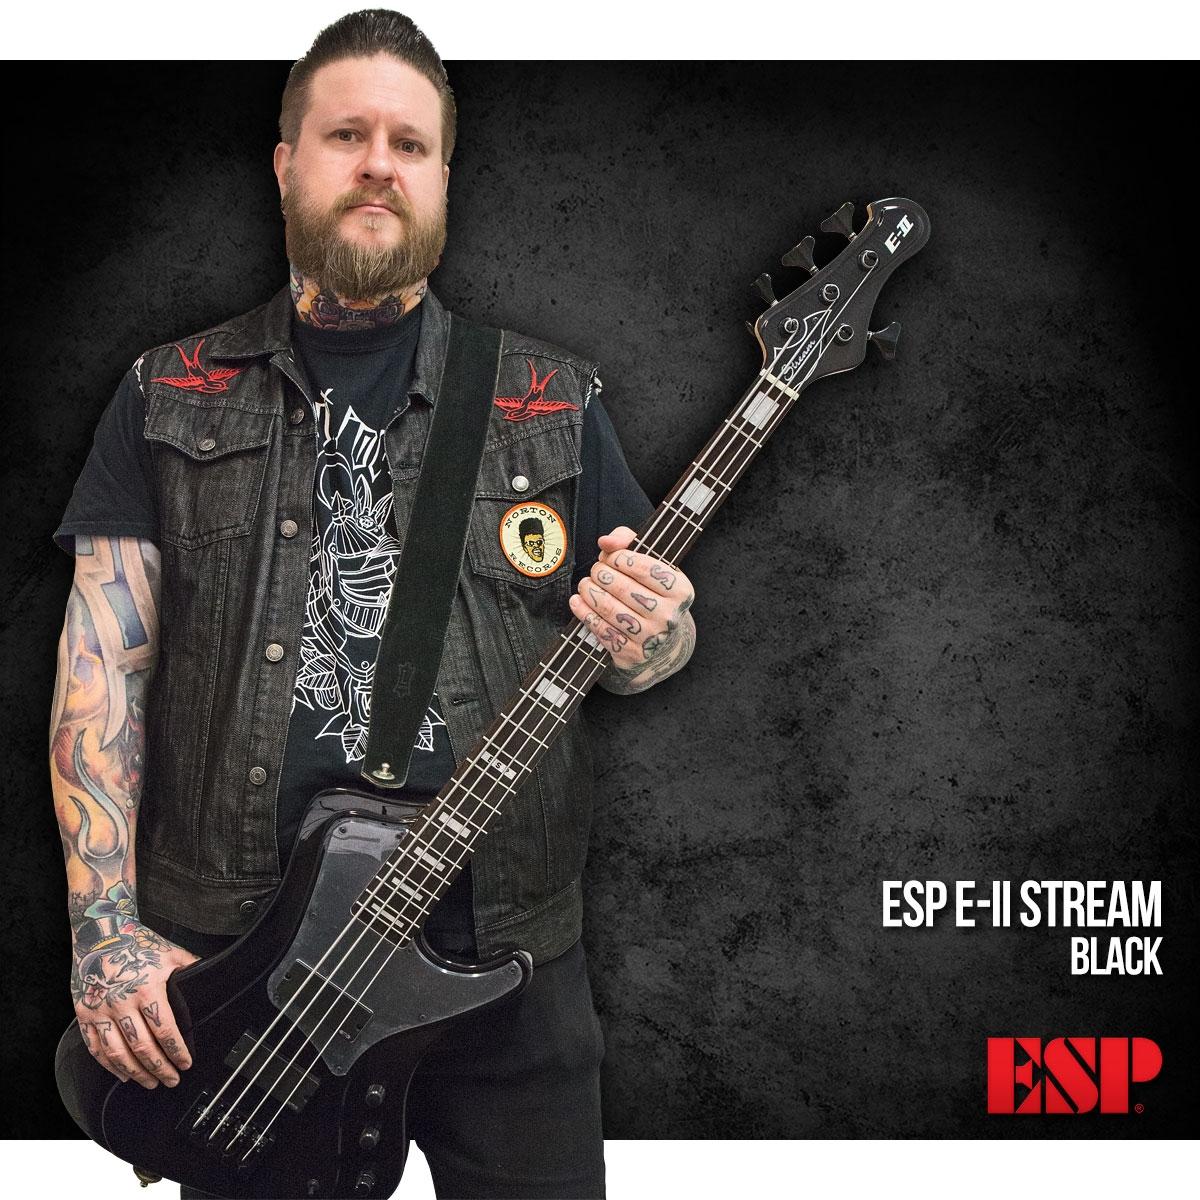 Ville Mäkinen, Apulanta - ESP E-II Stream